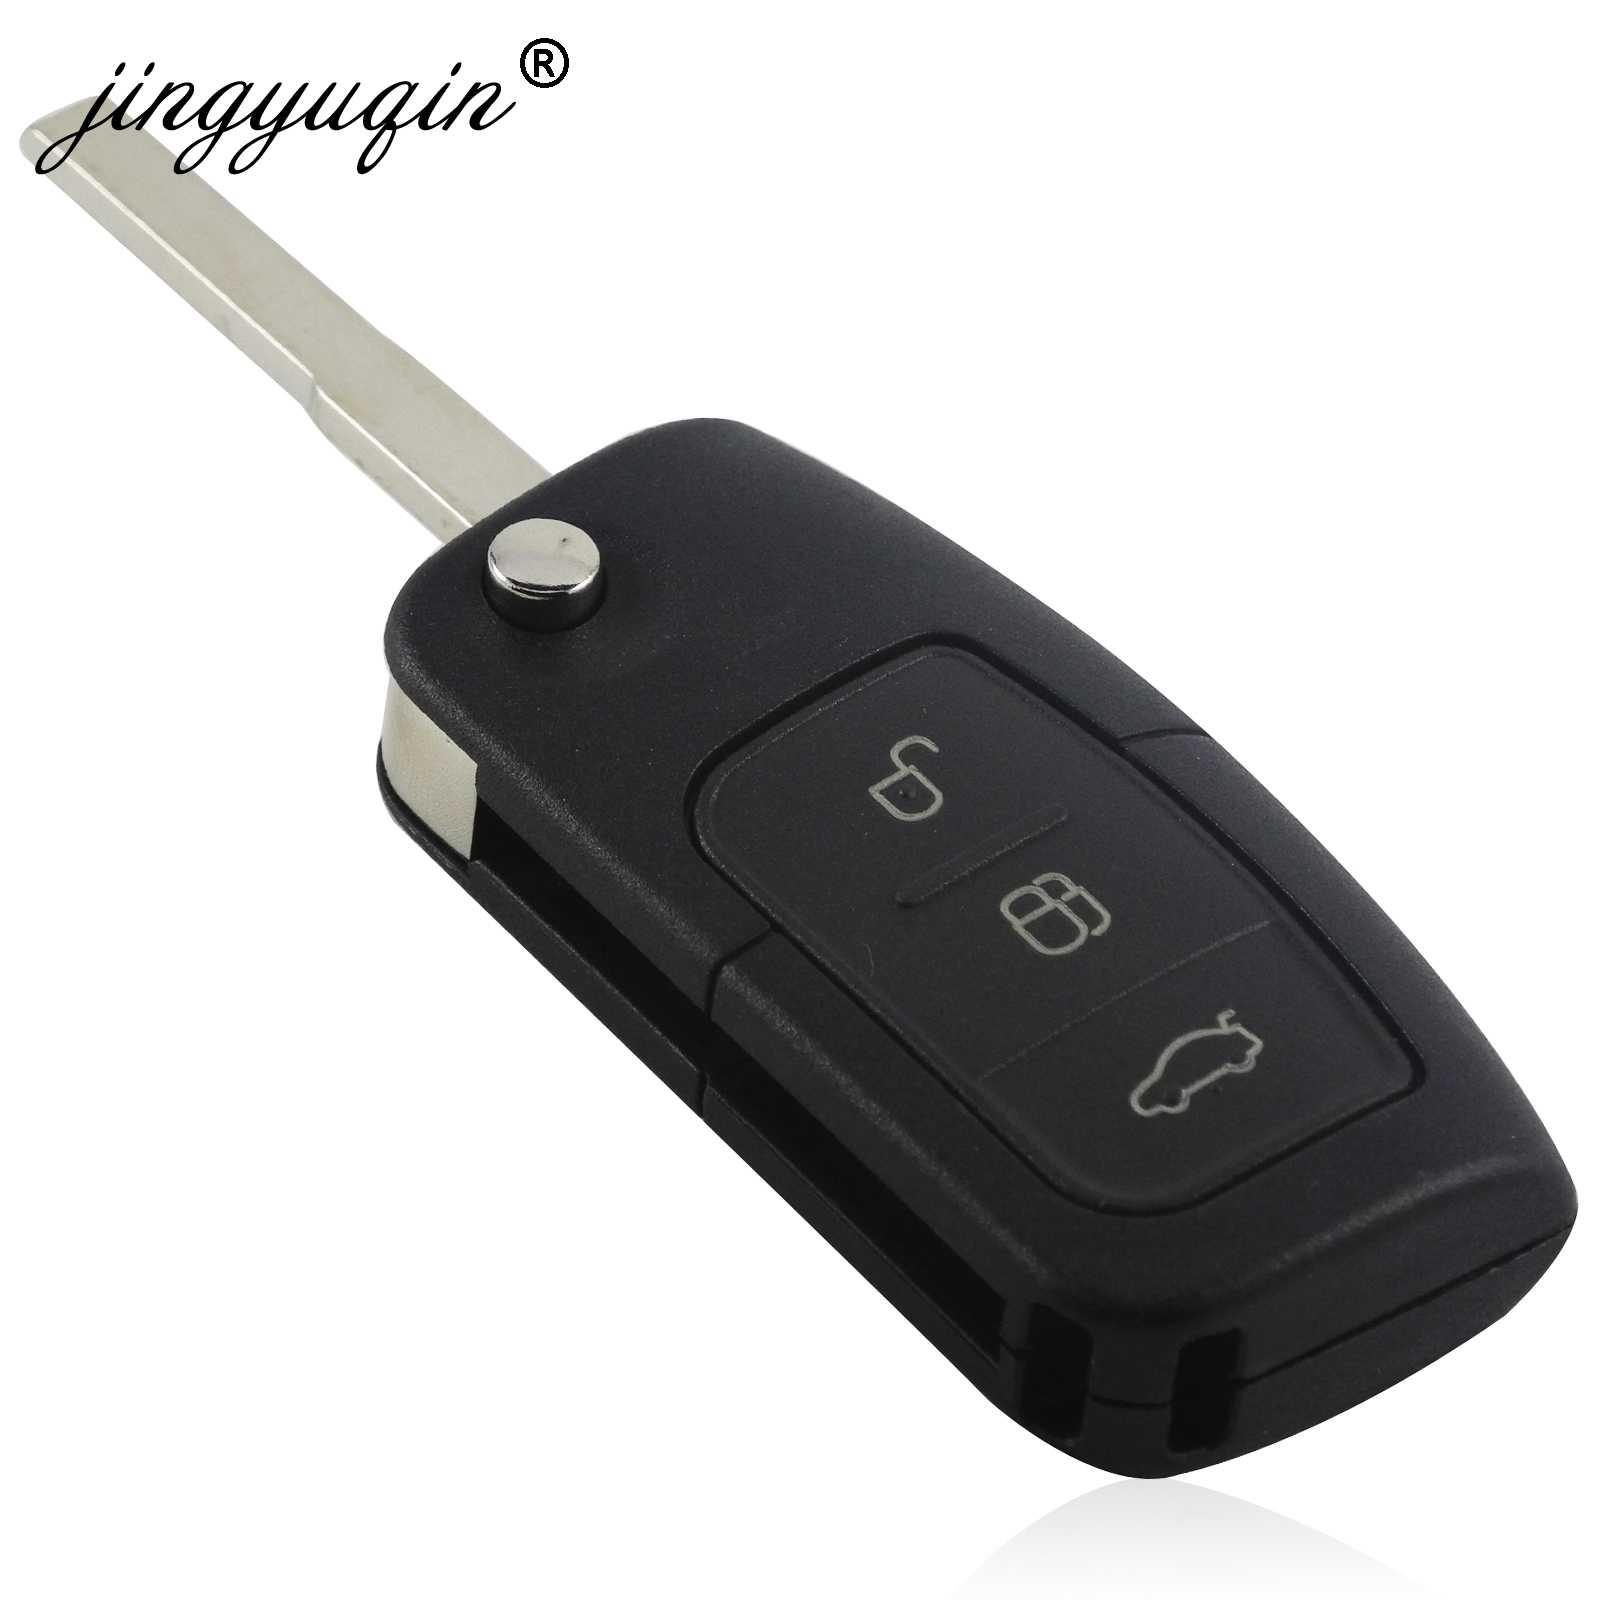 Jingyuqin 433MHz 4D63 4D60 سيارة مفتاح بعيد لفورد فيوجن فوكس مونديو فييستا غالاكسي HU101 FO21 شفرة مفاتيح السيارة الوجه